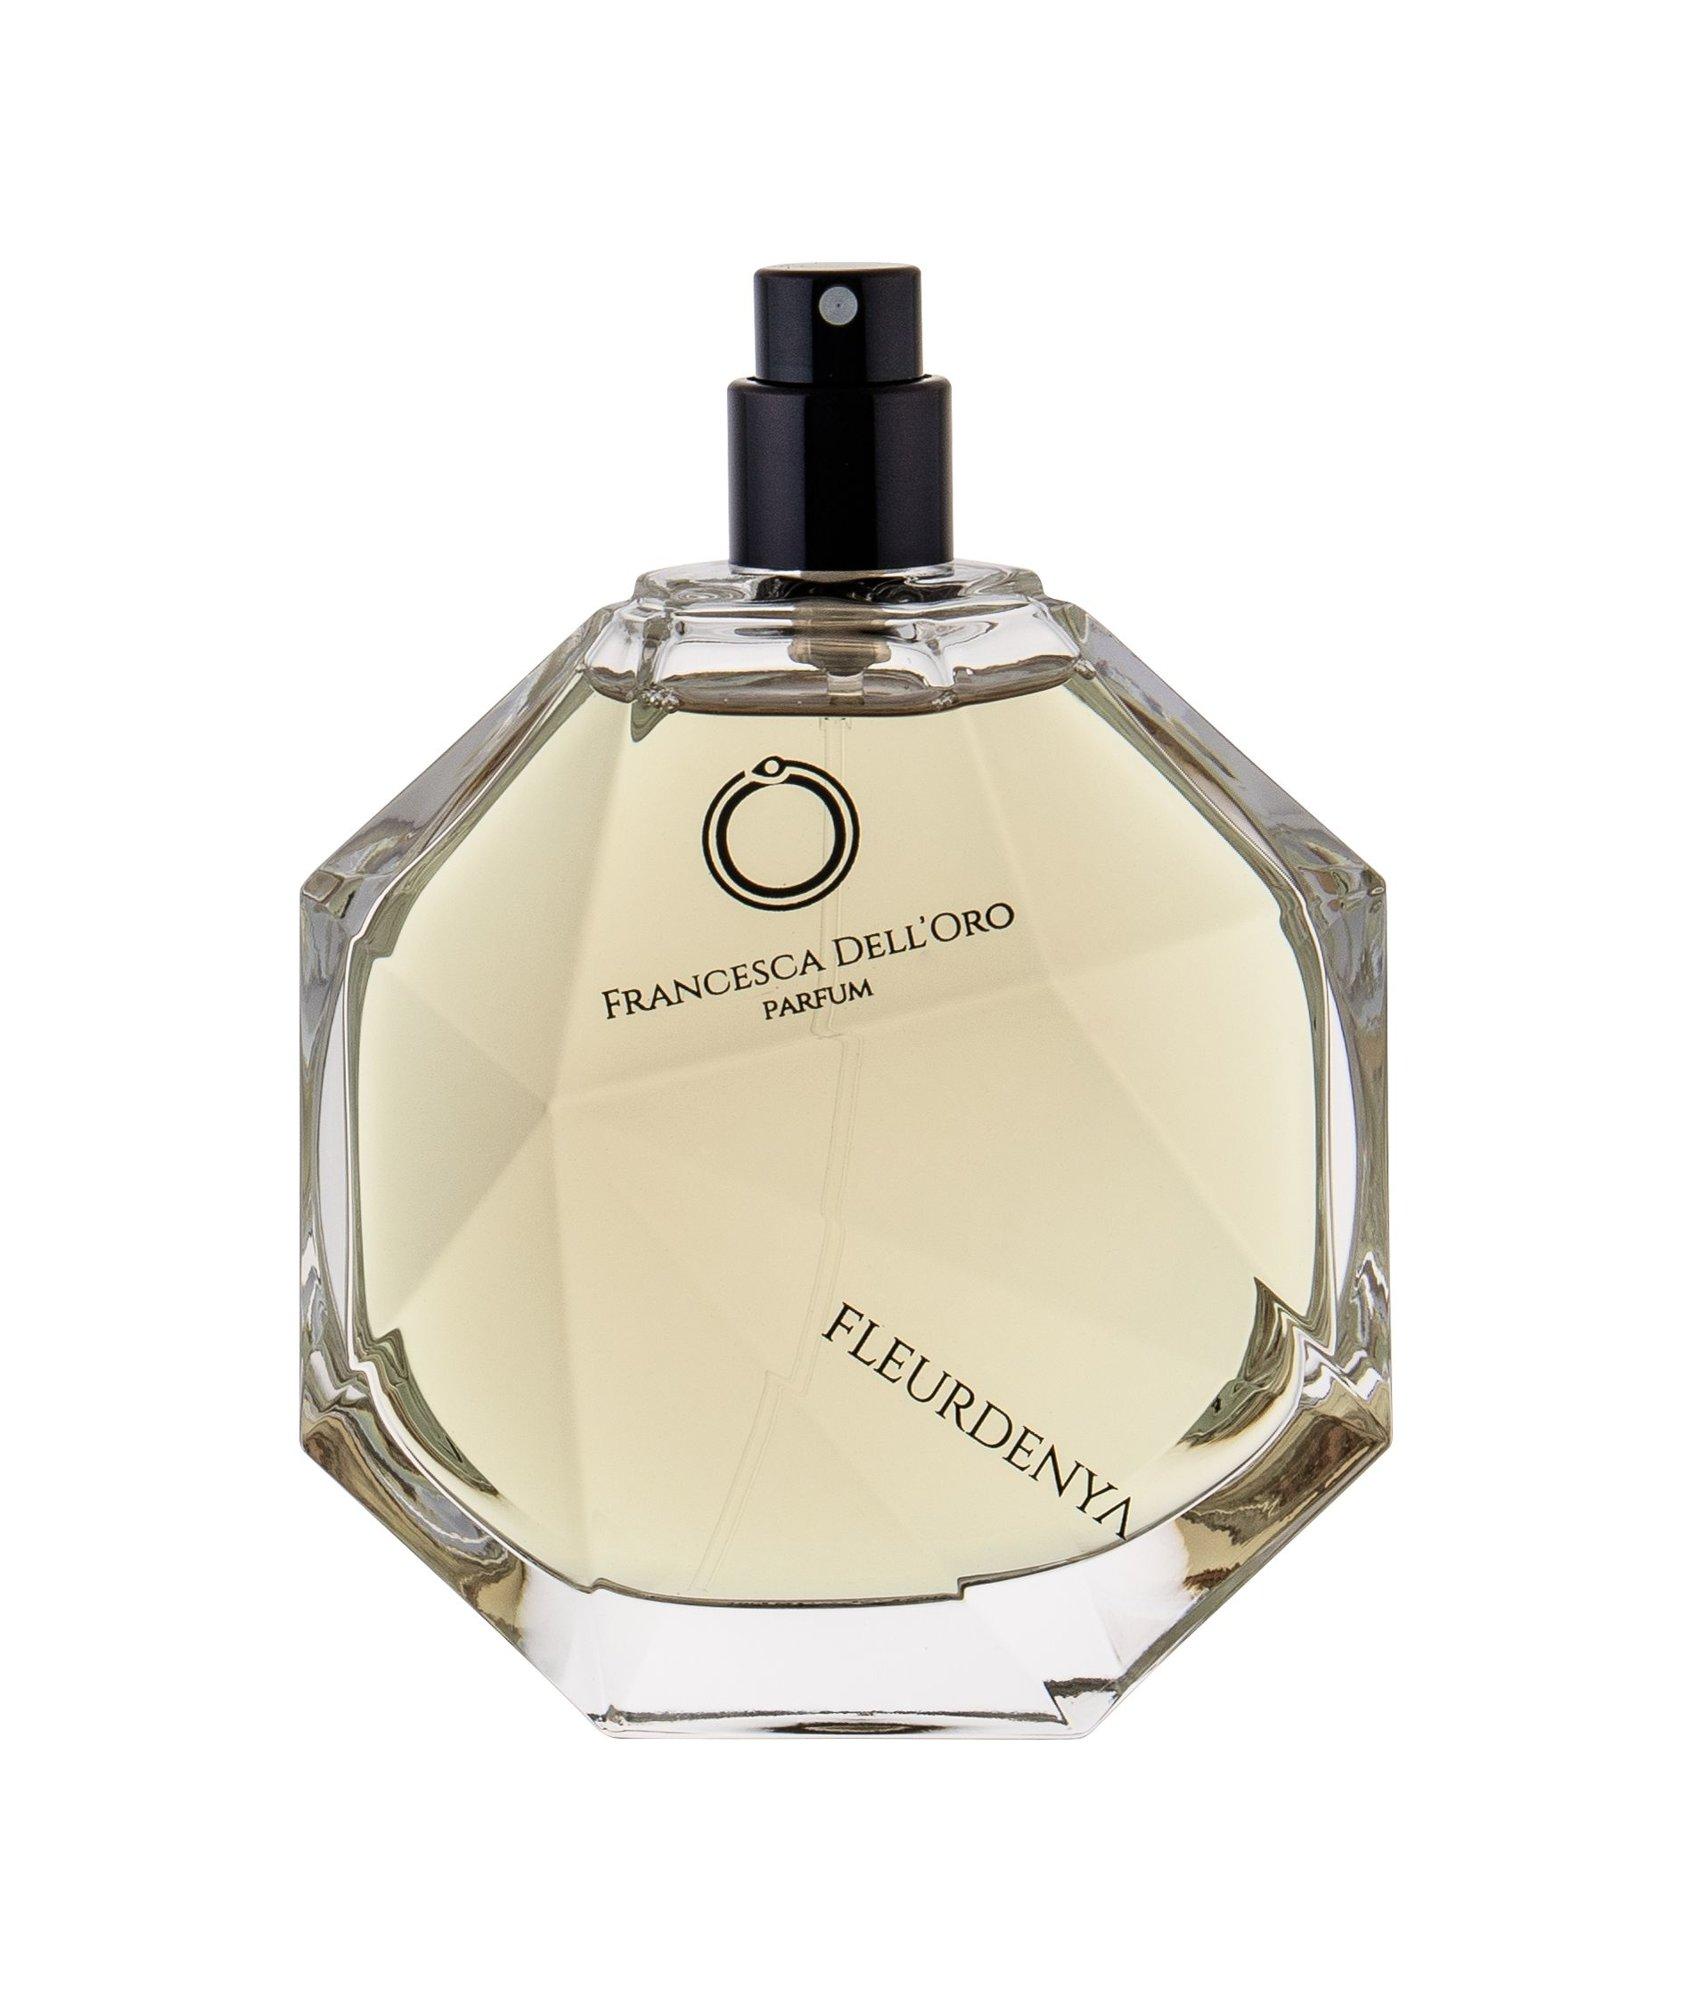 Francesca dell´Oro Fleurdenya Eau de Parfum 100ml